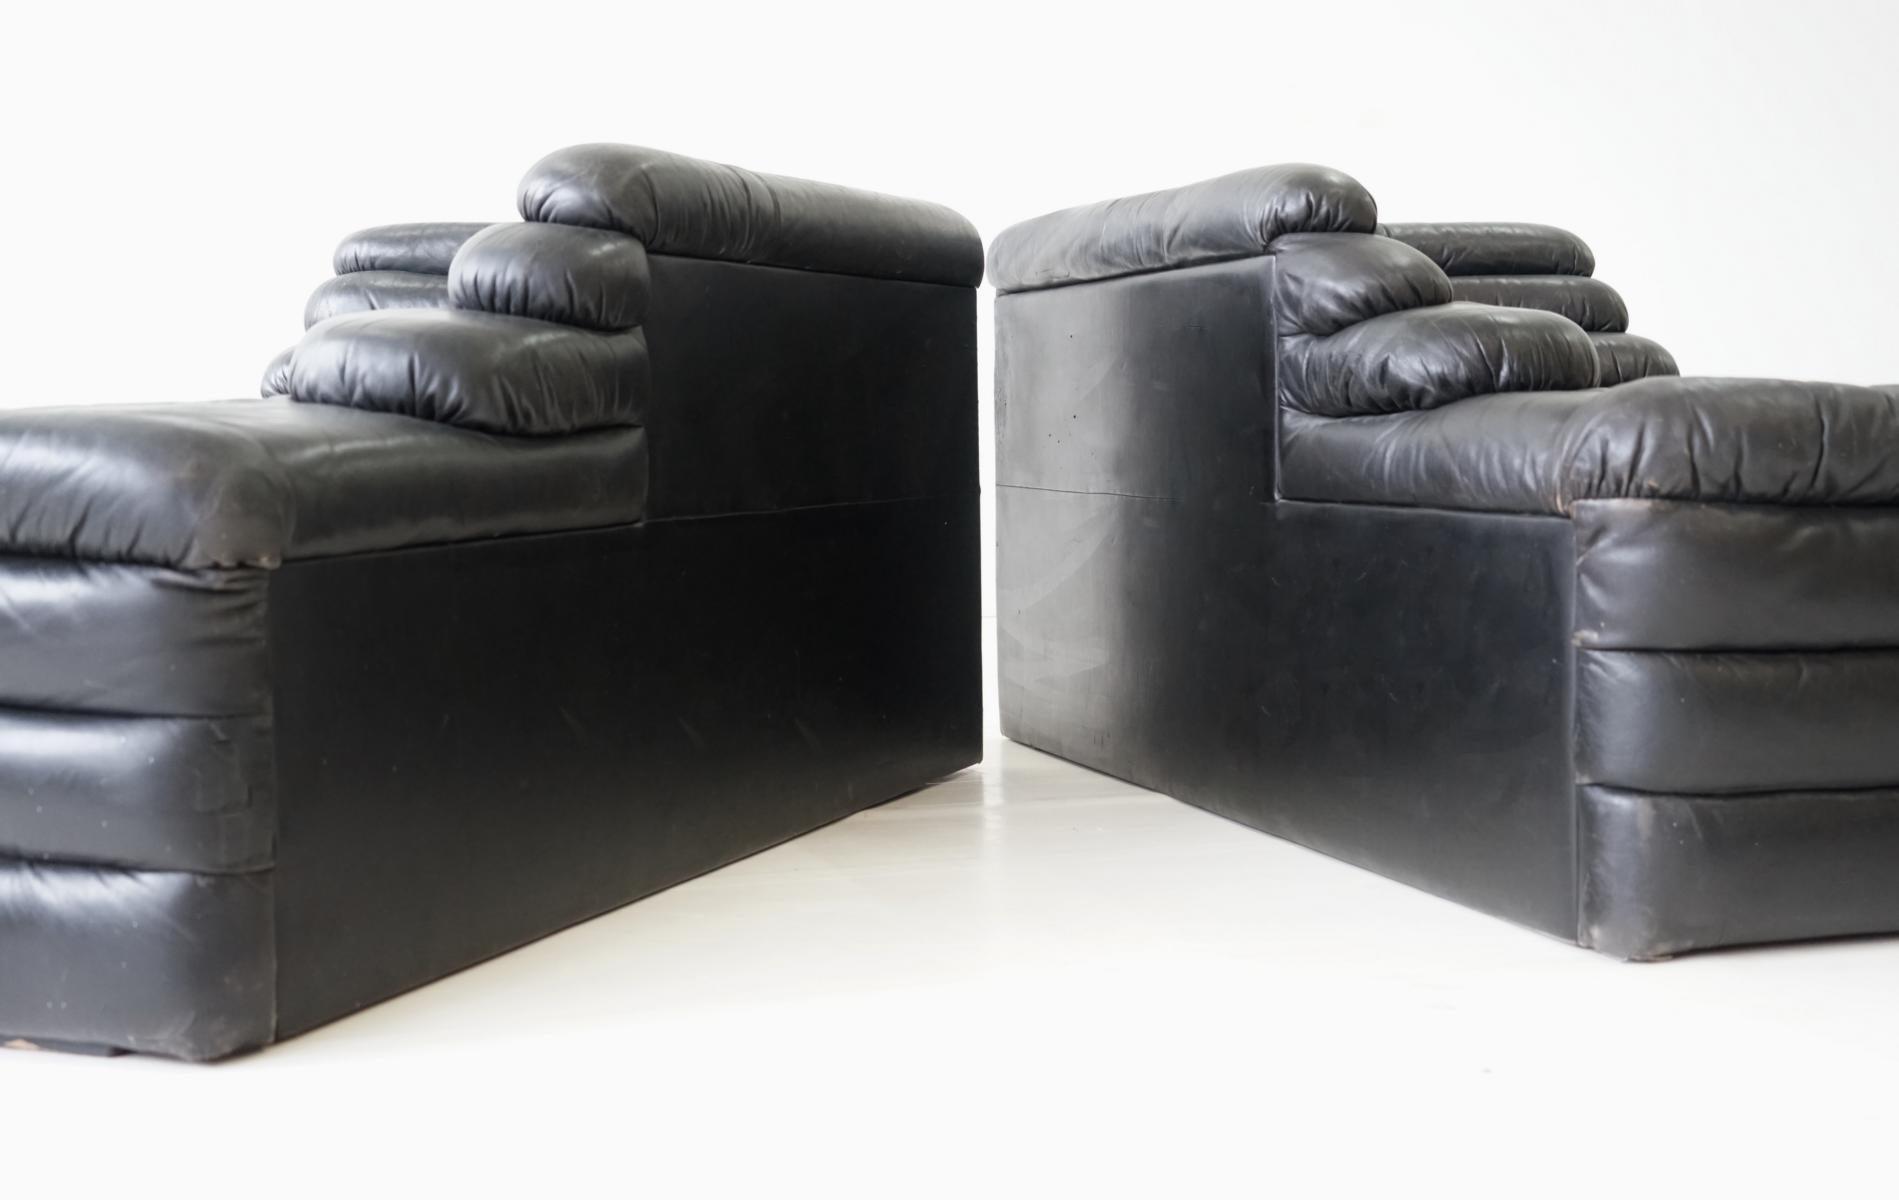 Original Leather Pair Of Ds 1025 Terrazza By Ubald Klug De